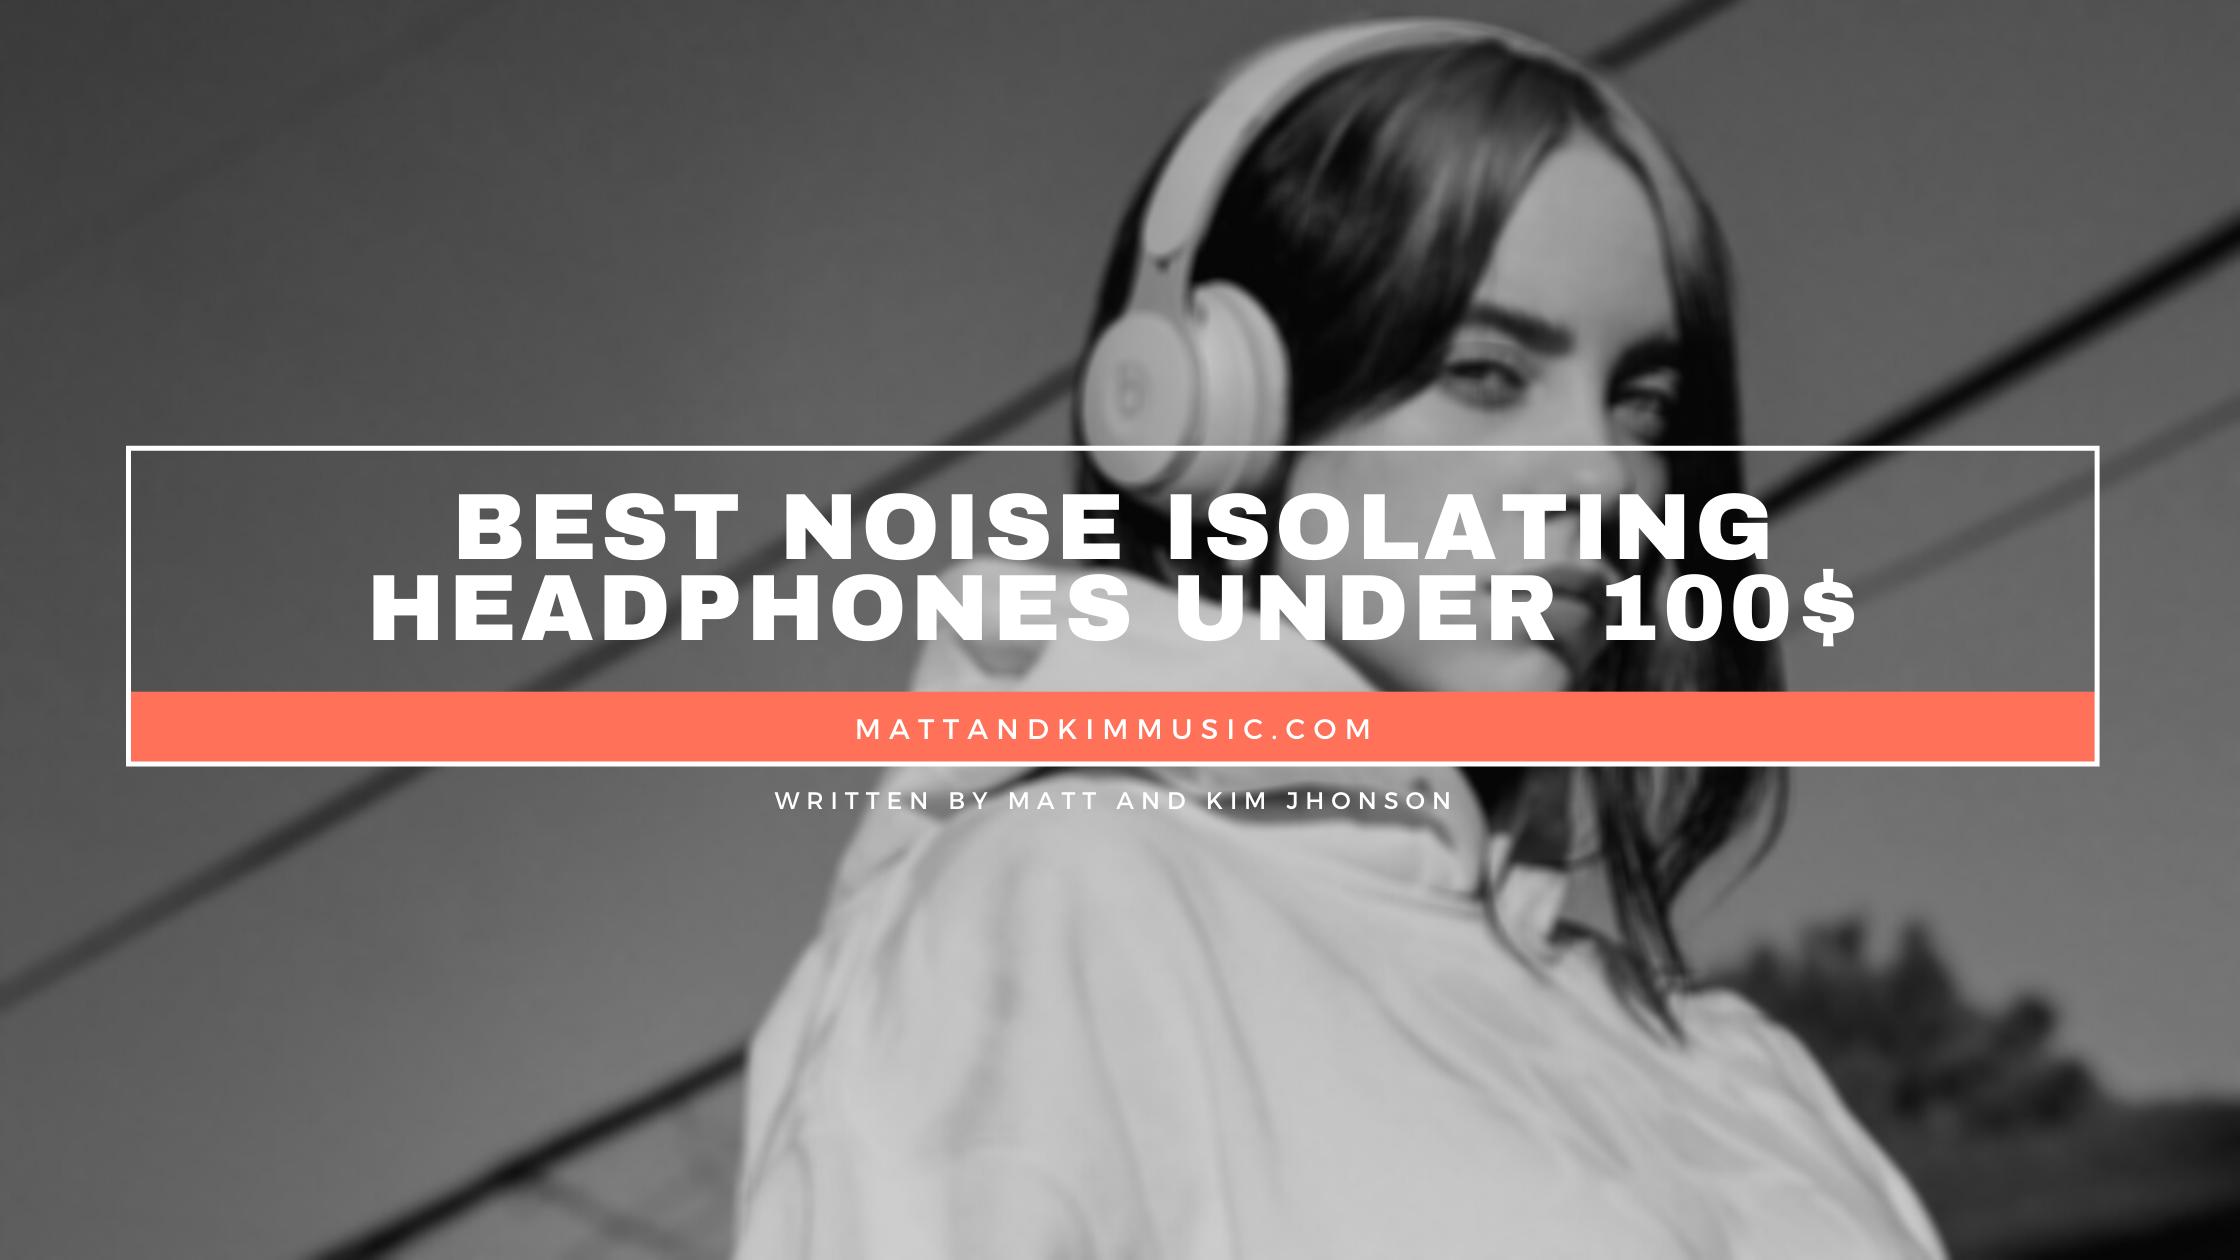 best noise isolating headphones under 100